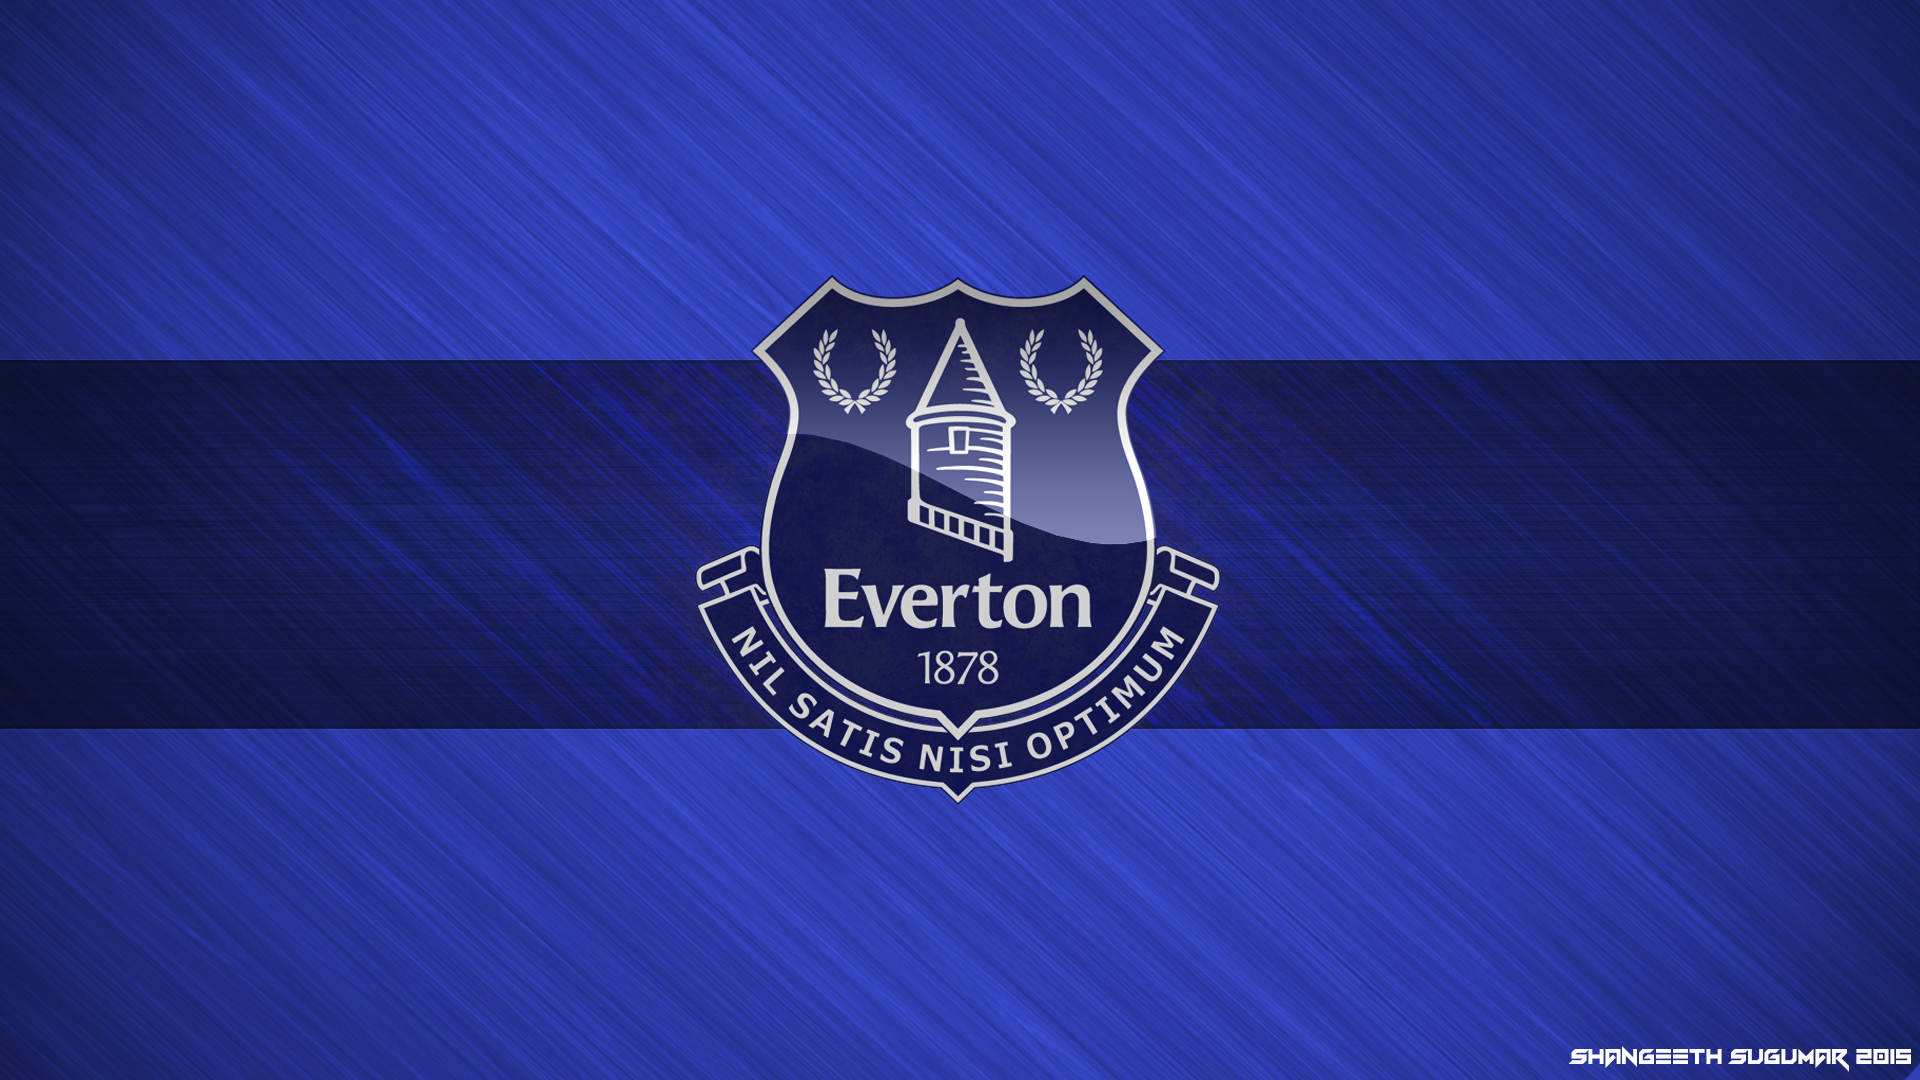 Everton Fc 2015 Wallpaper By Shangeeth Sugumar By